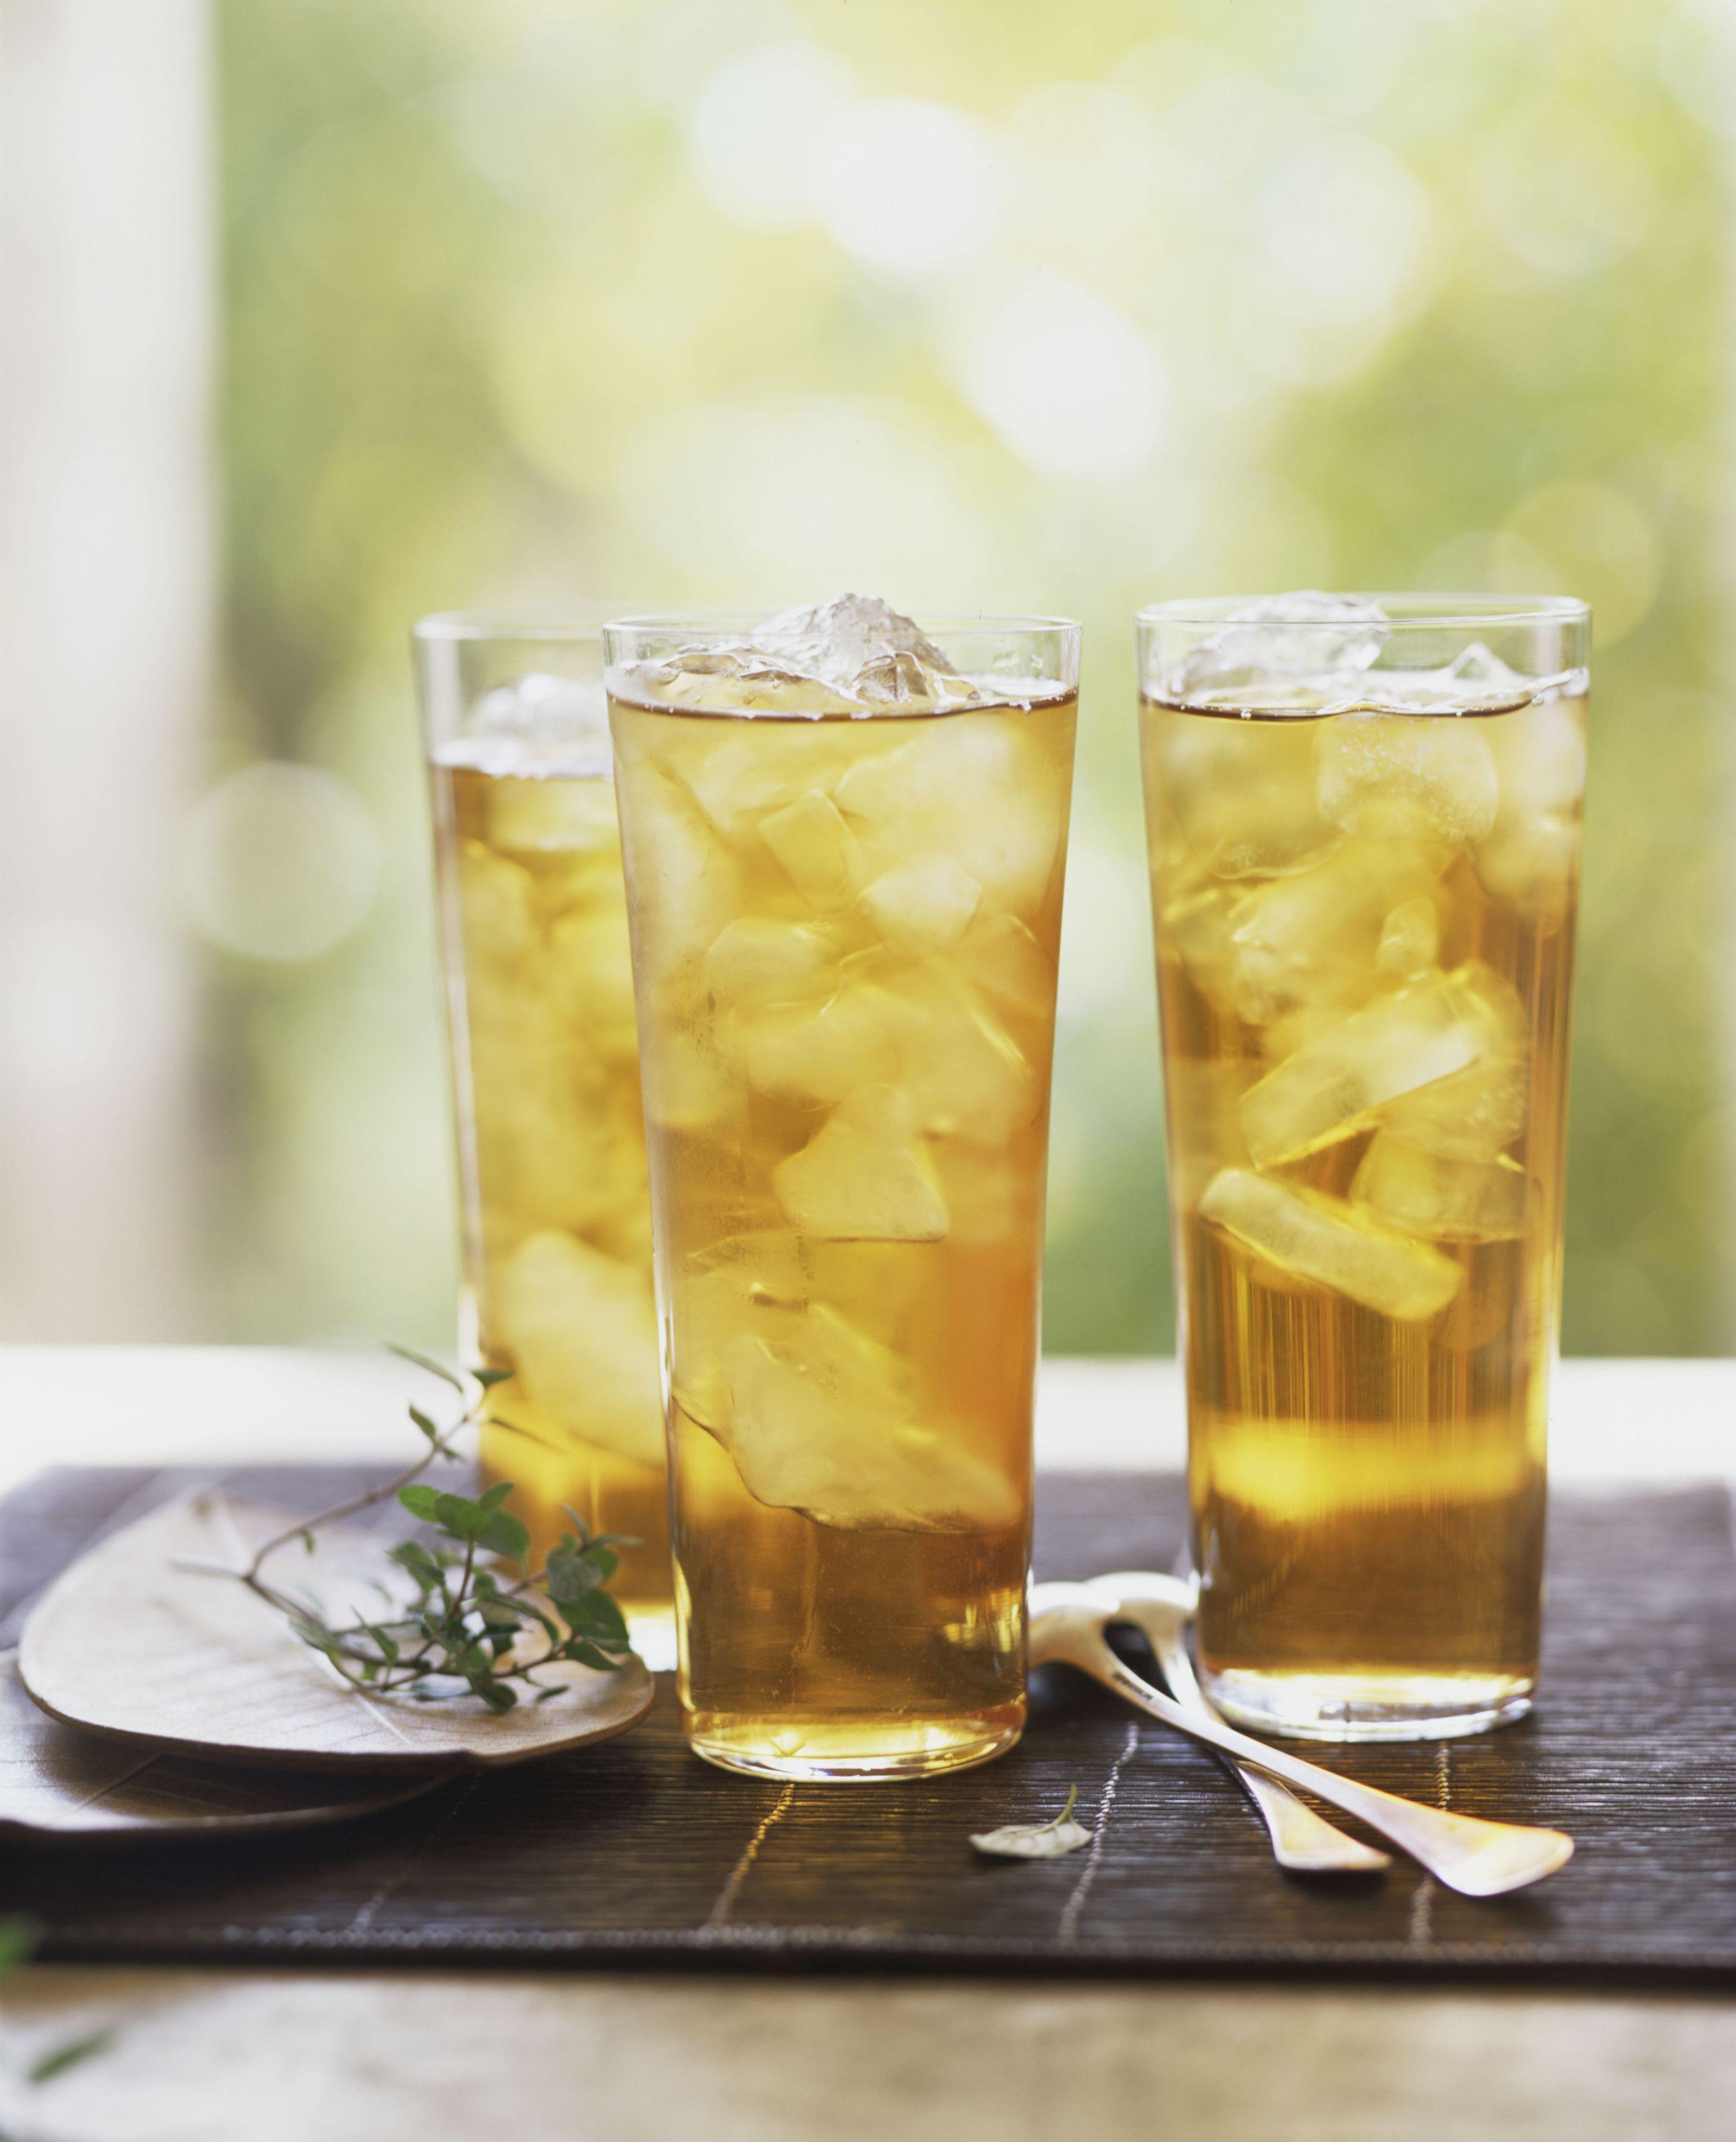 How To Cold Brew Yerba Mate Yerba Mate Yerba Mate Tea Cold Brew